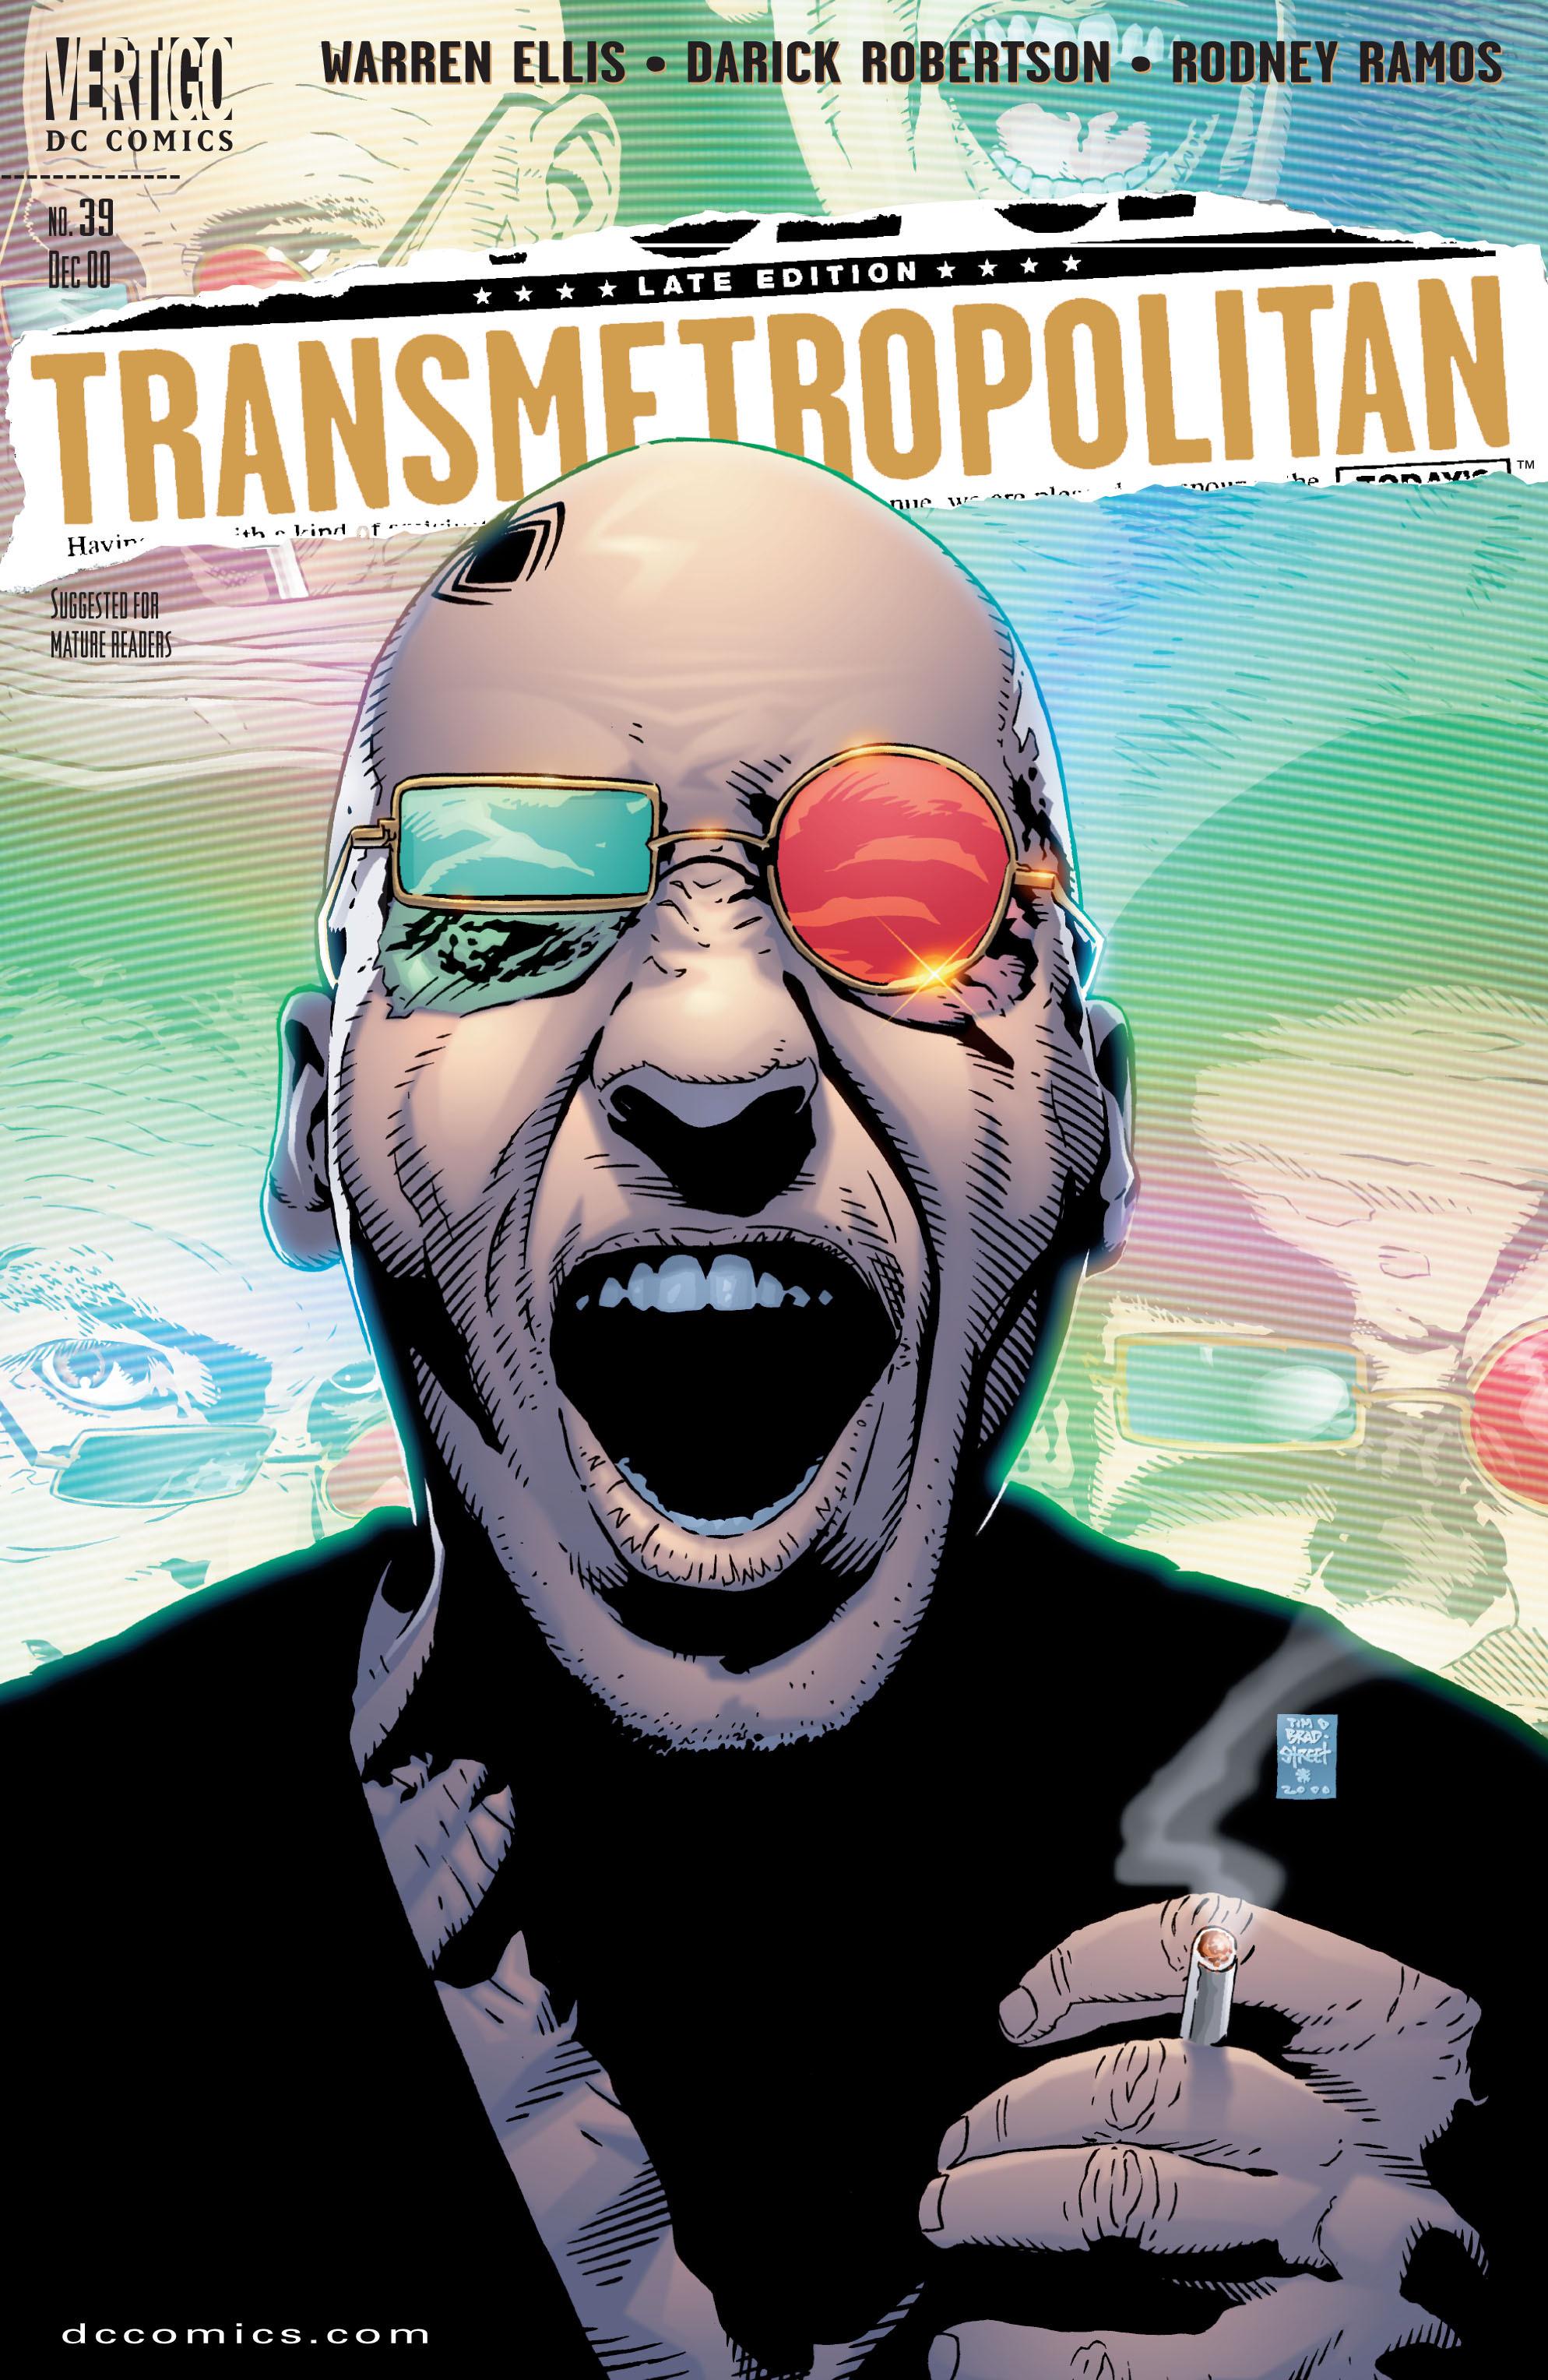 Read online Transmetropolitan comic -  Issue #39 - 1